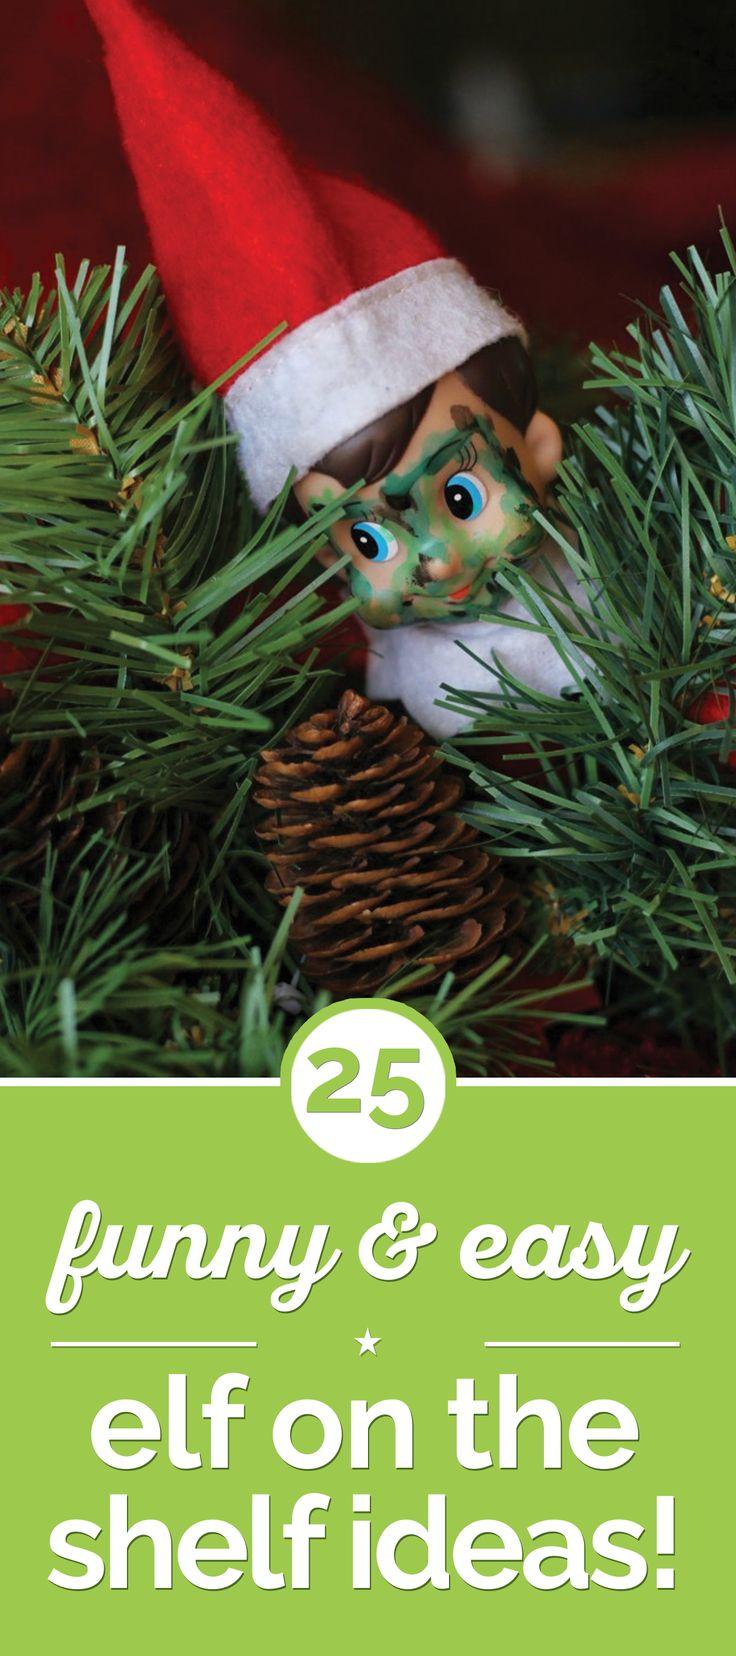 25 Funny & Easy Elf on the Shelf Ideas!